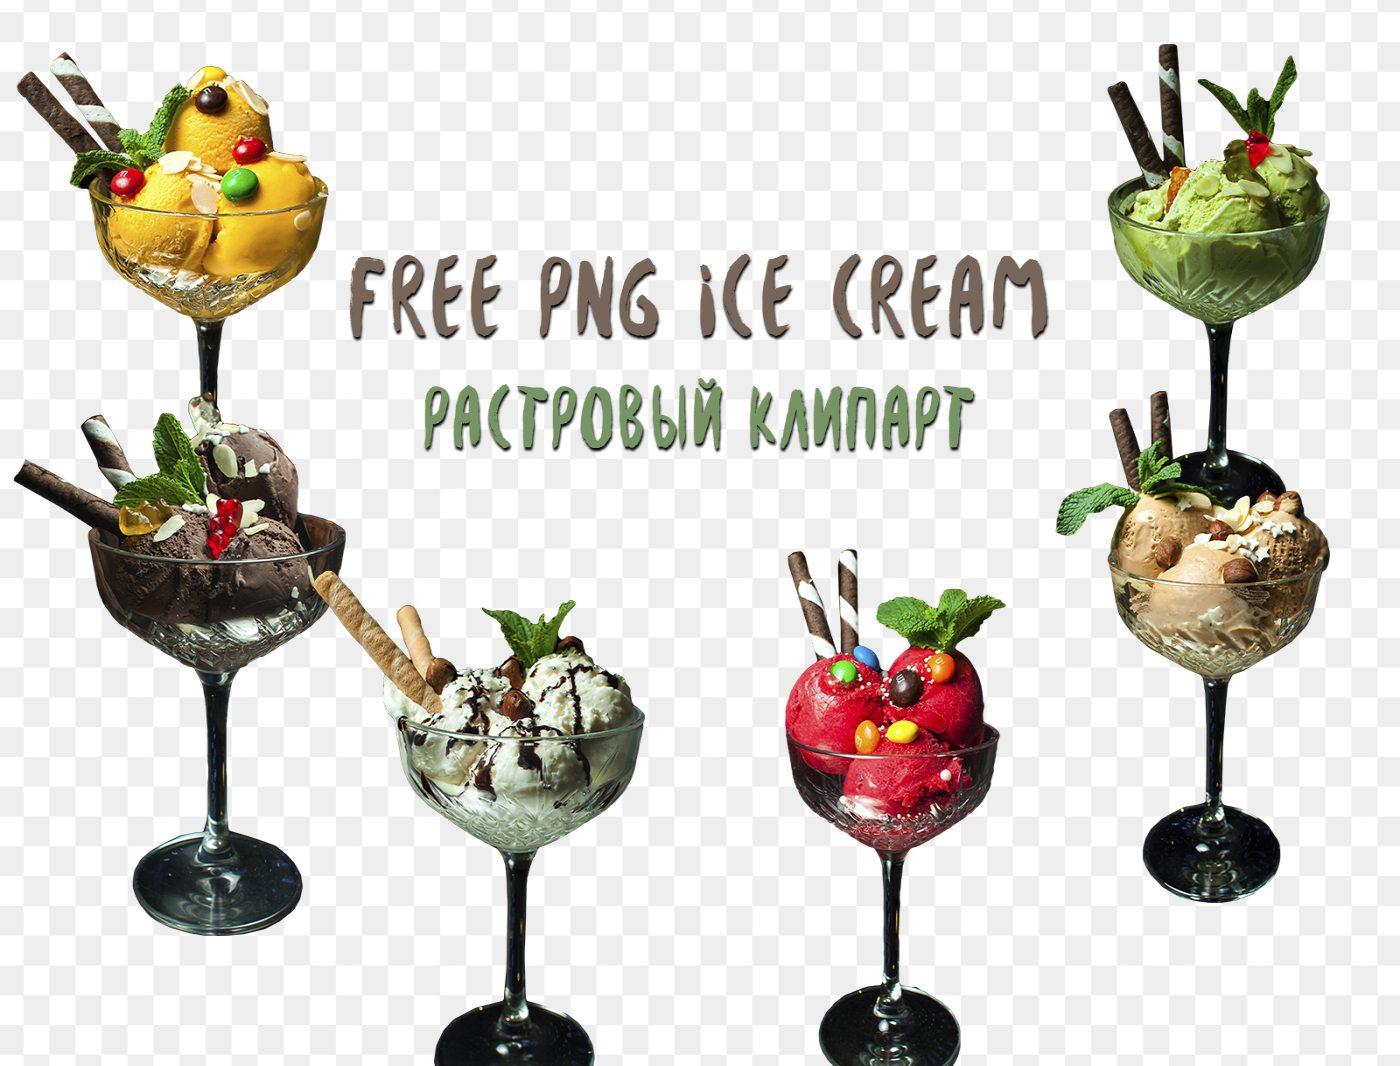 FREE PNG Ice Cream